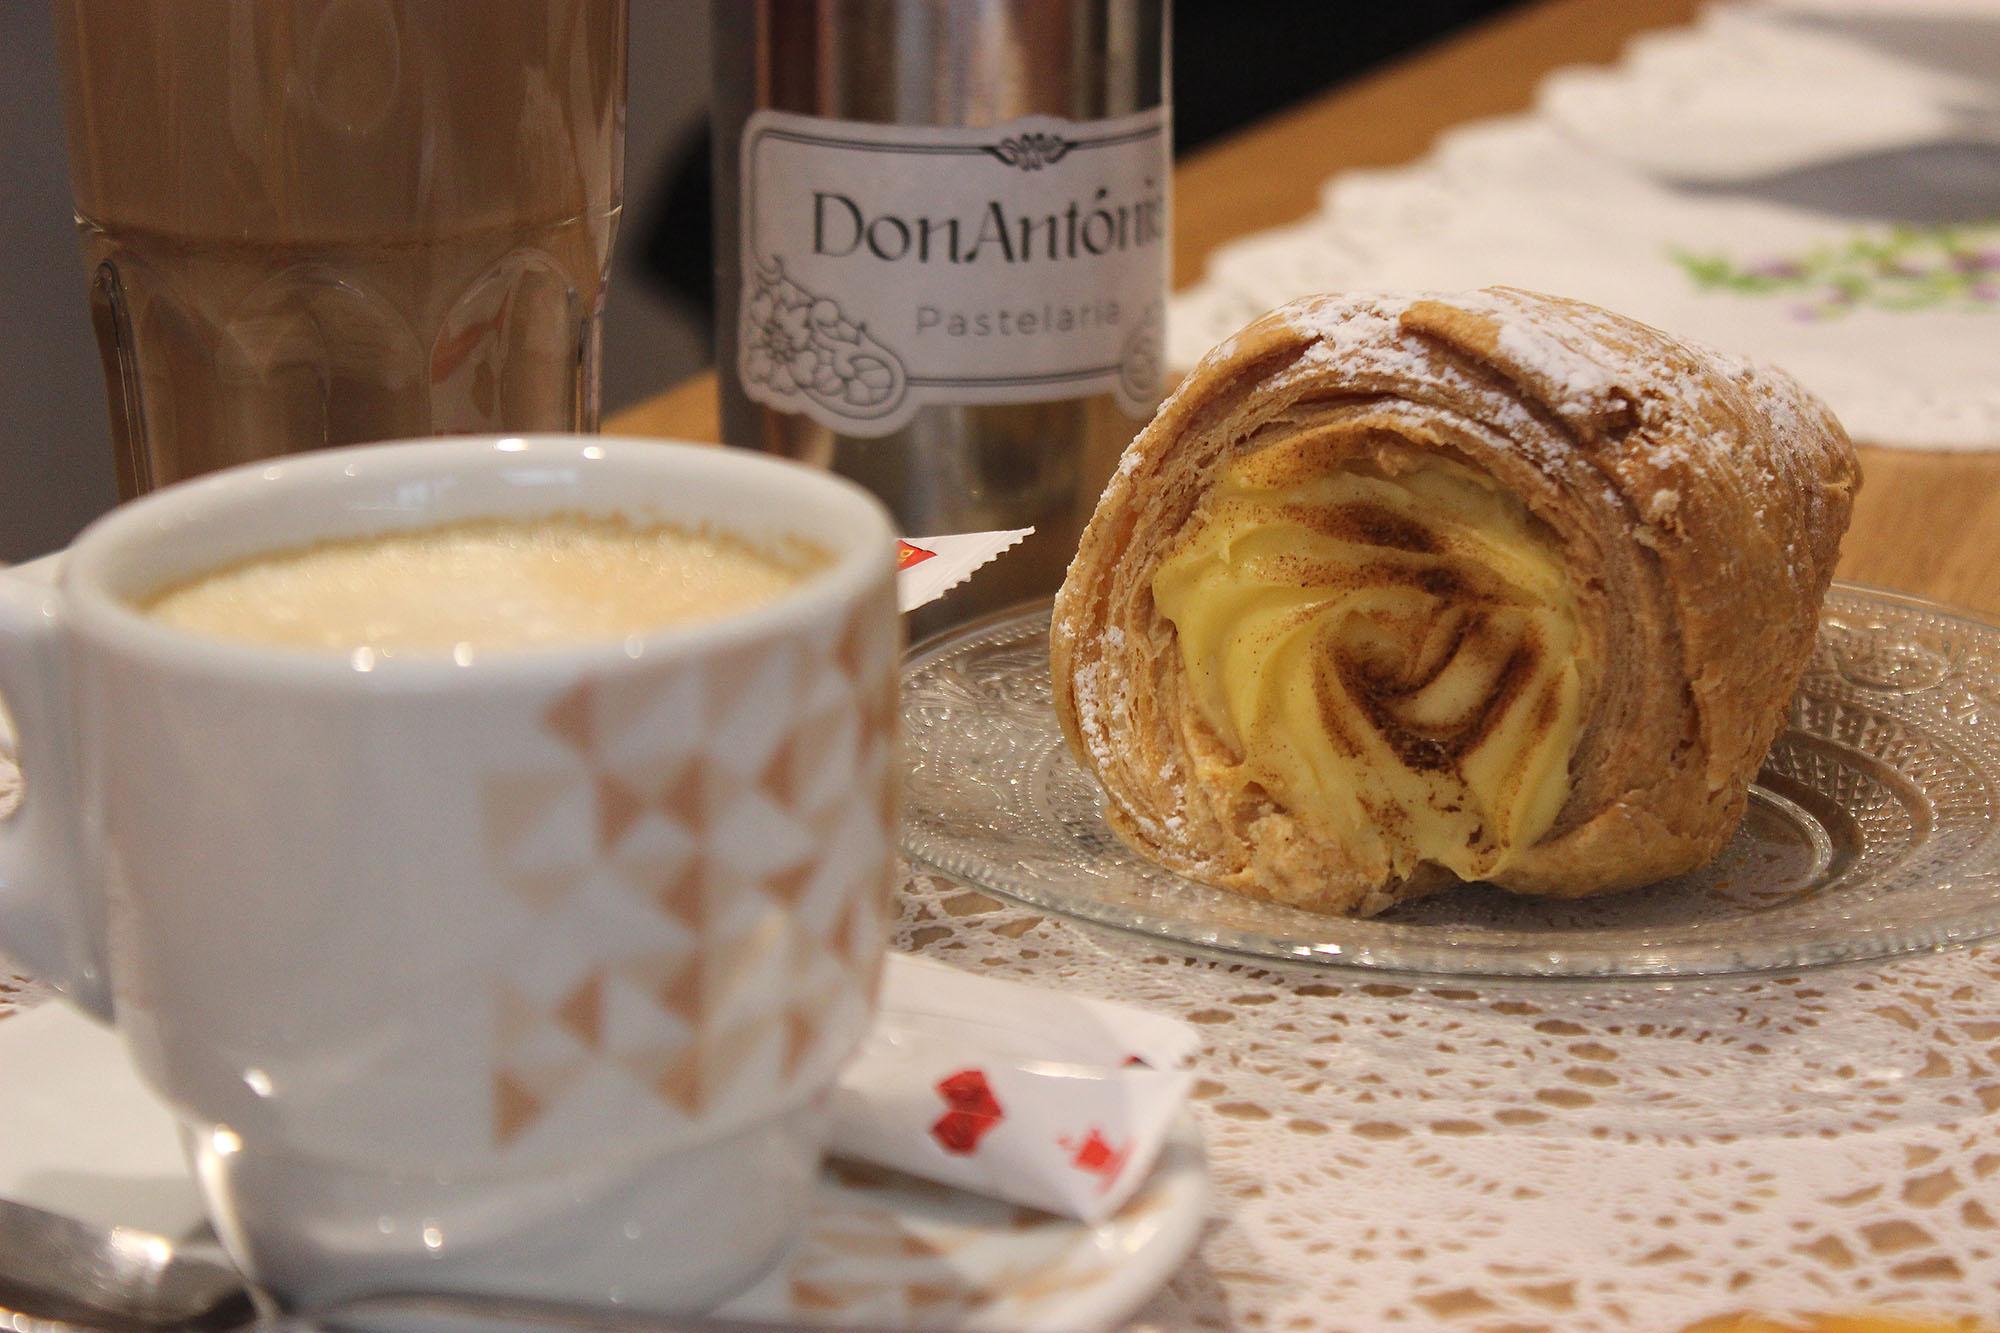 HiP Paris Blog DonAntonia Pastelaria Canal St Martin